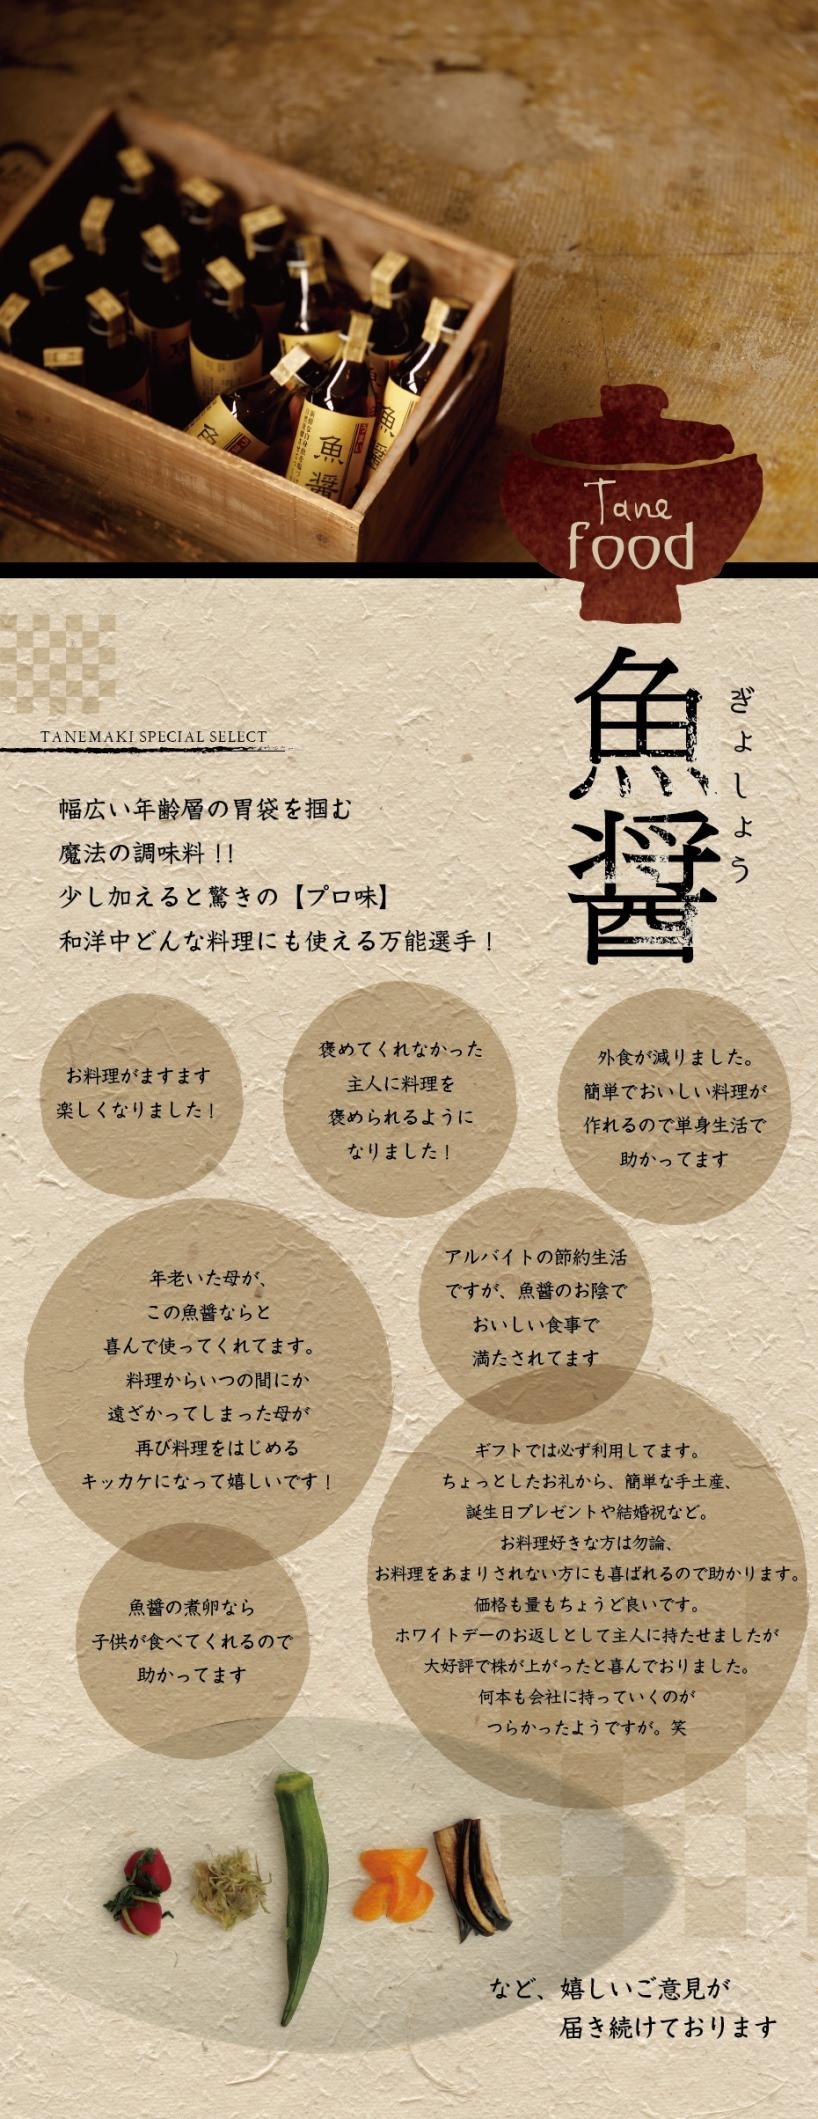 0319_gyosho-1.jpg